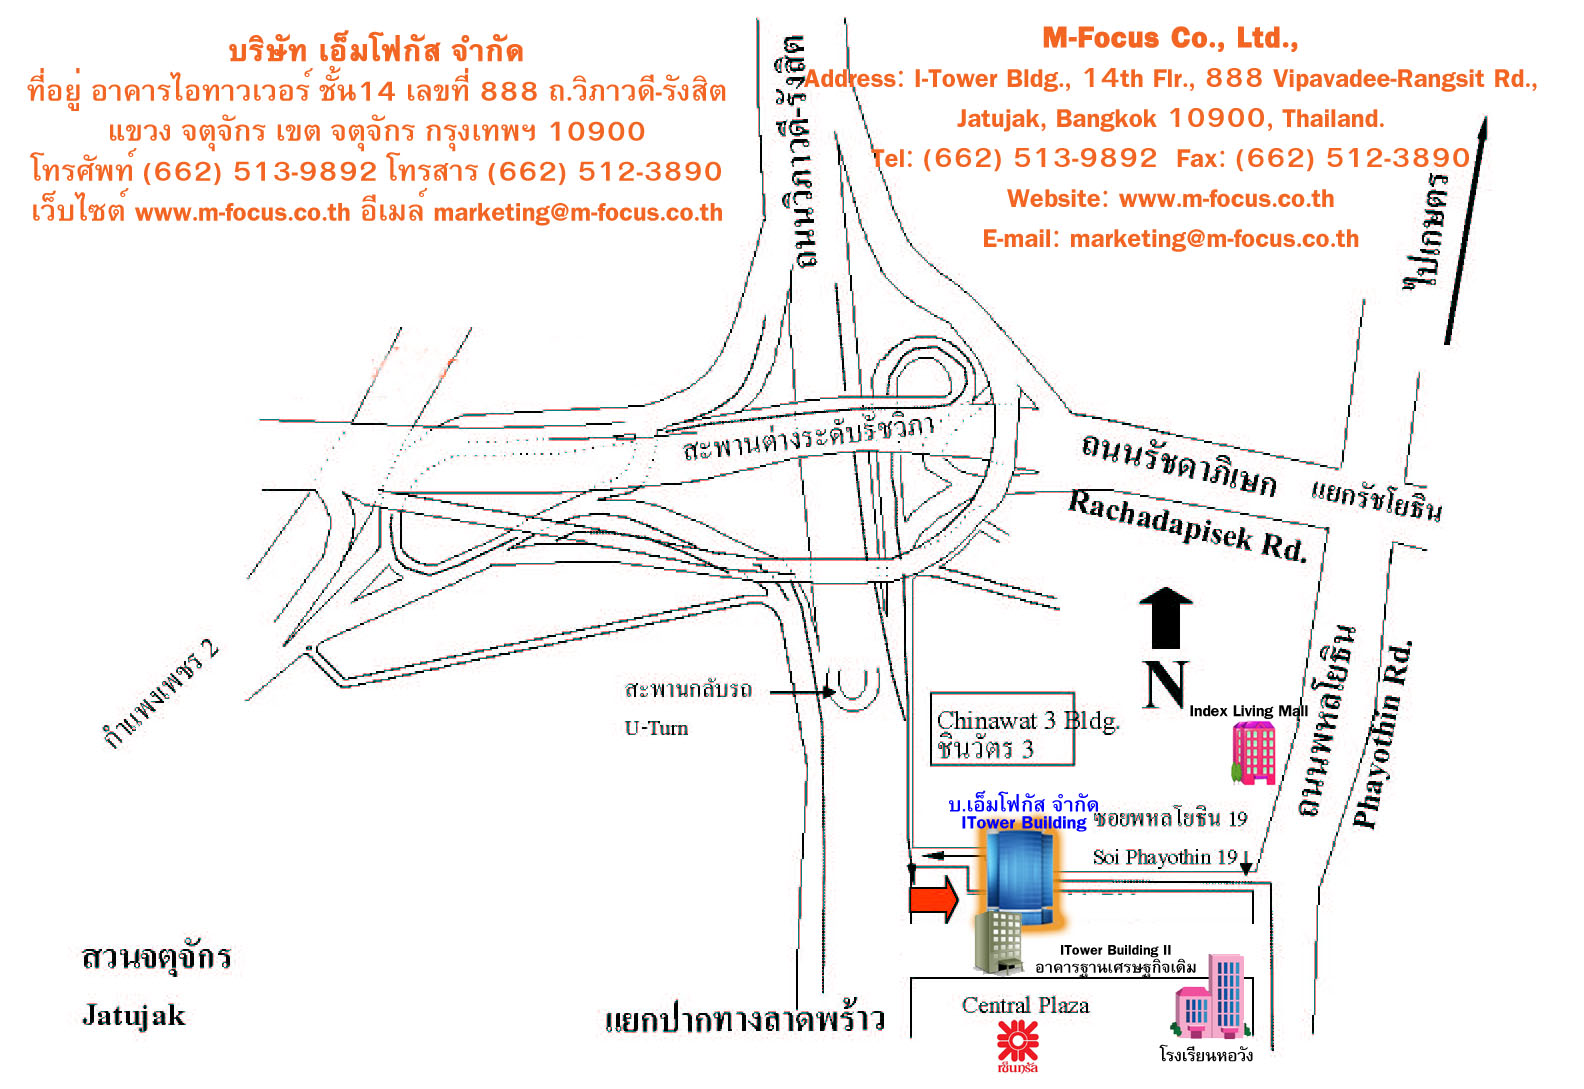 Simulation Software: M-Focus Co , Ltd  Providing Advanced IT